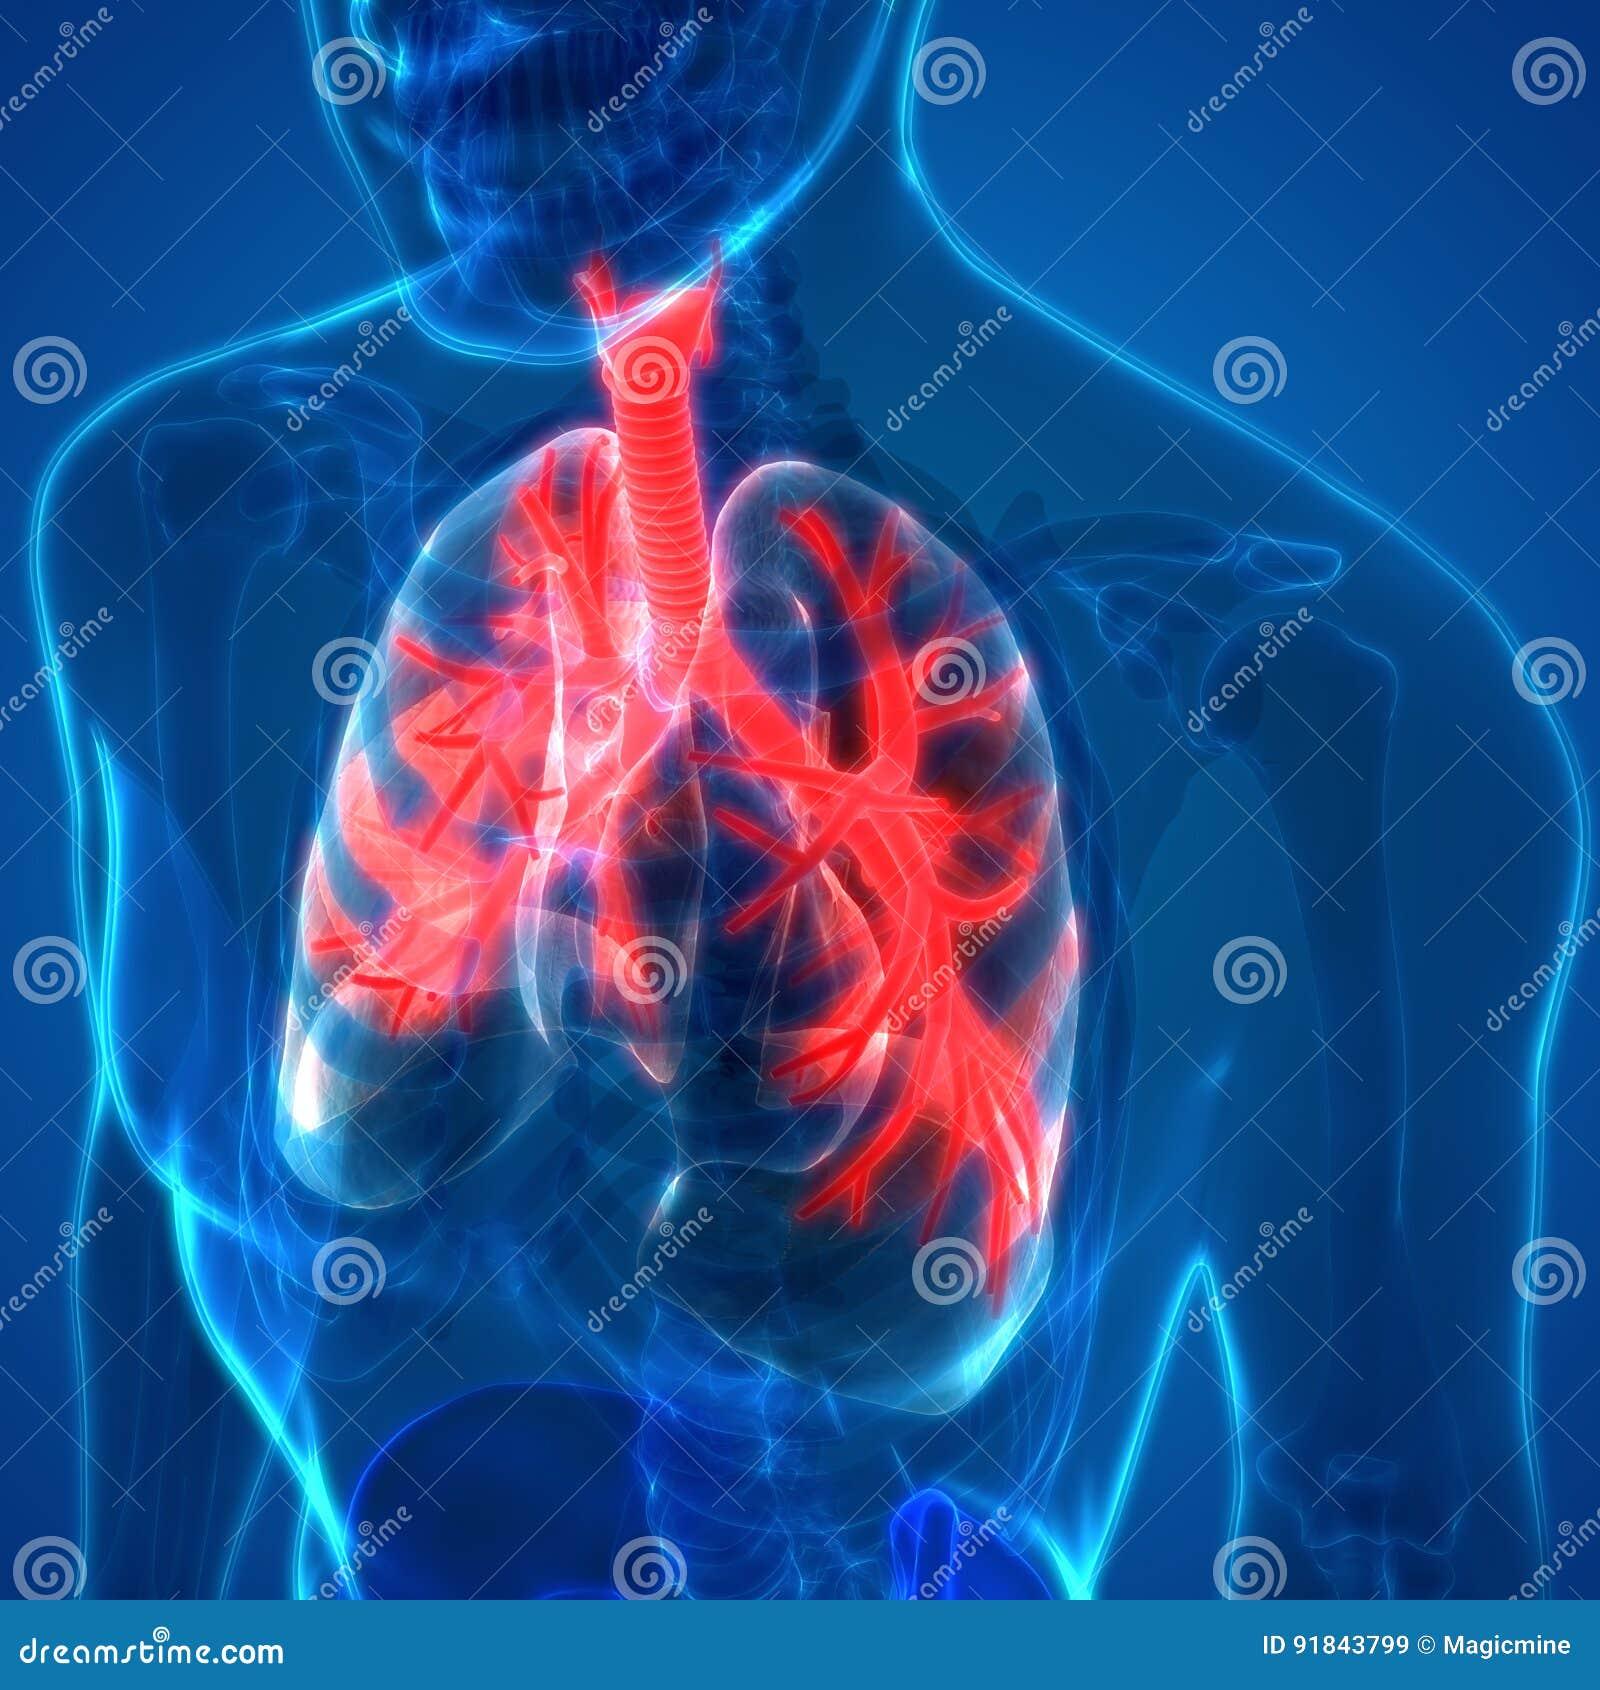 Human Lungs Inside Anatomy Larynx Trachea Bronchioles Stock